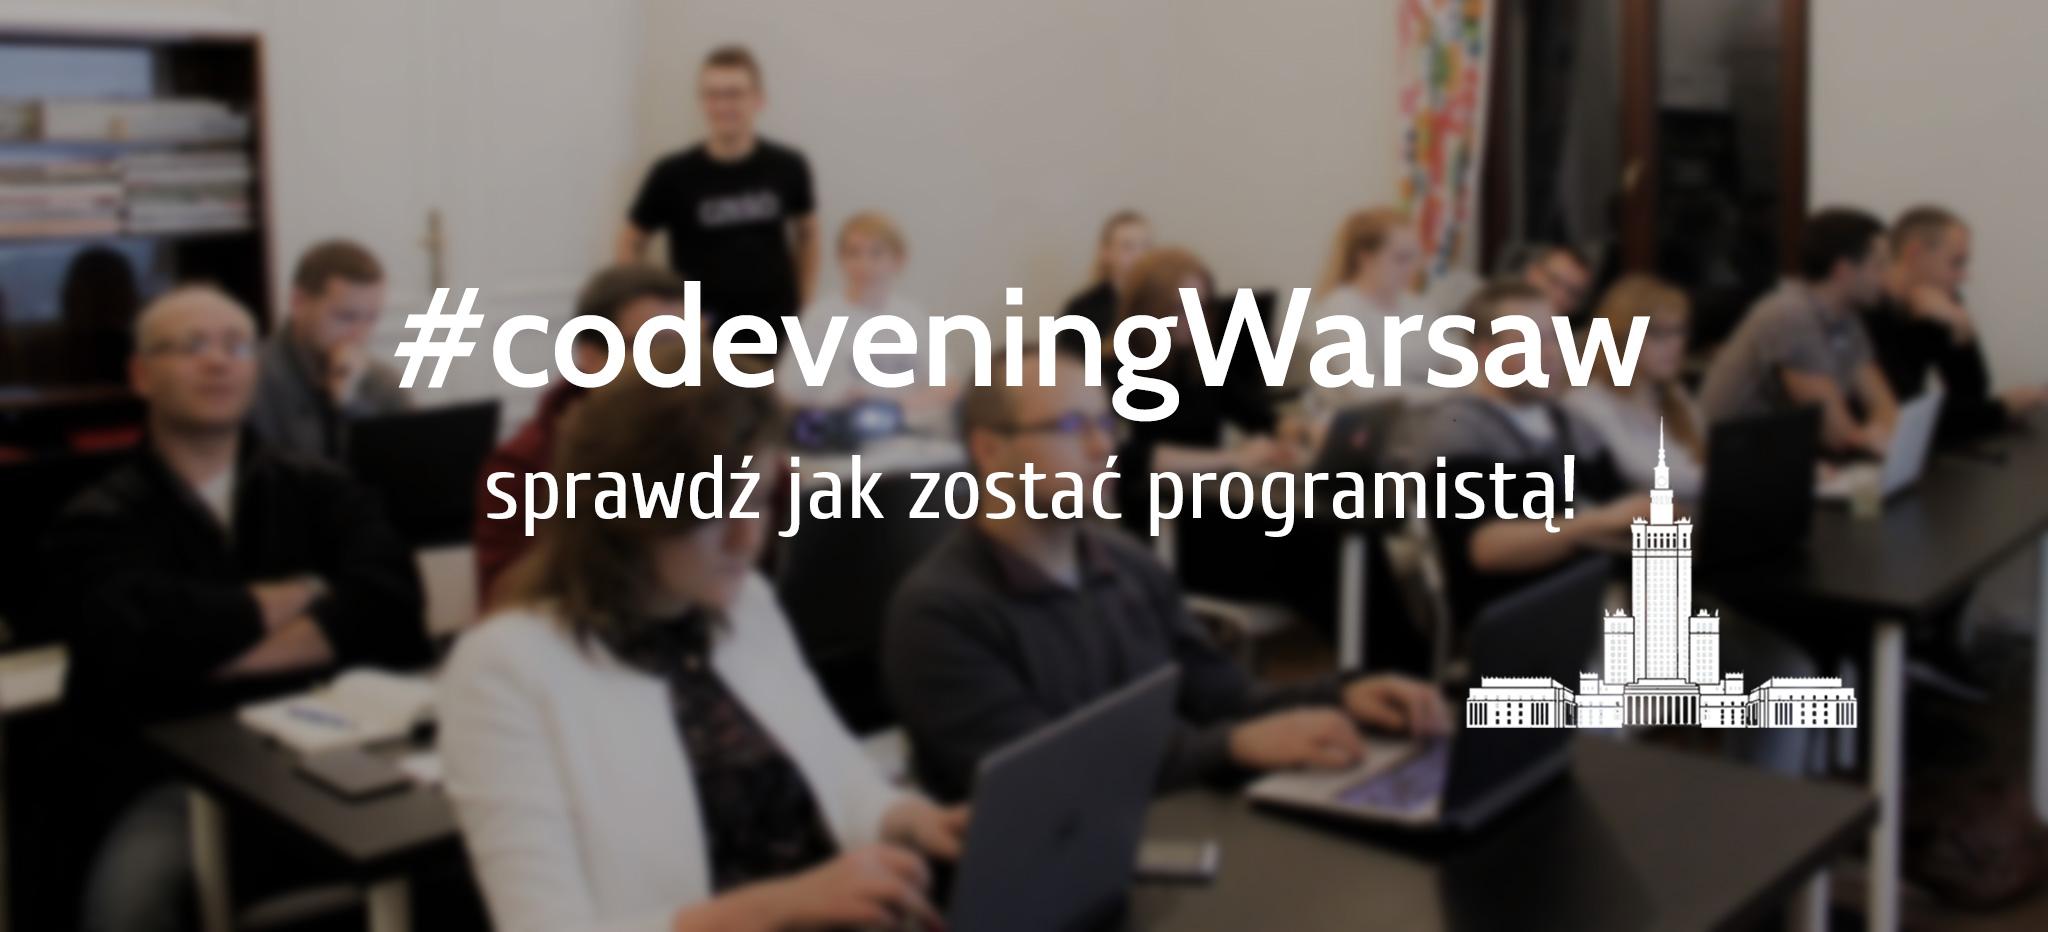 CodeveningWarsaw